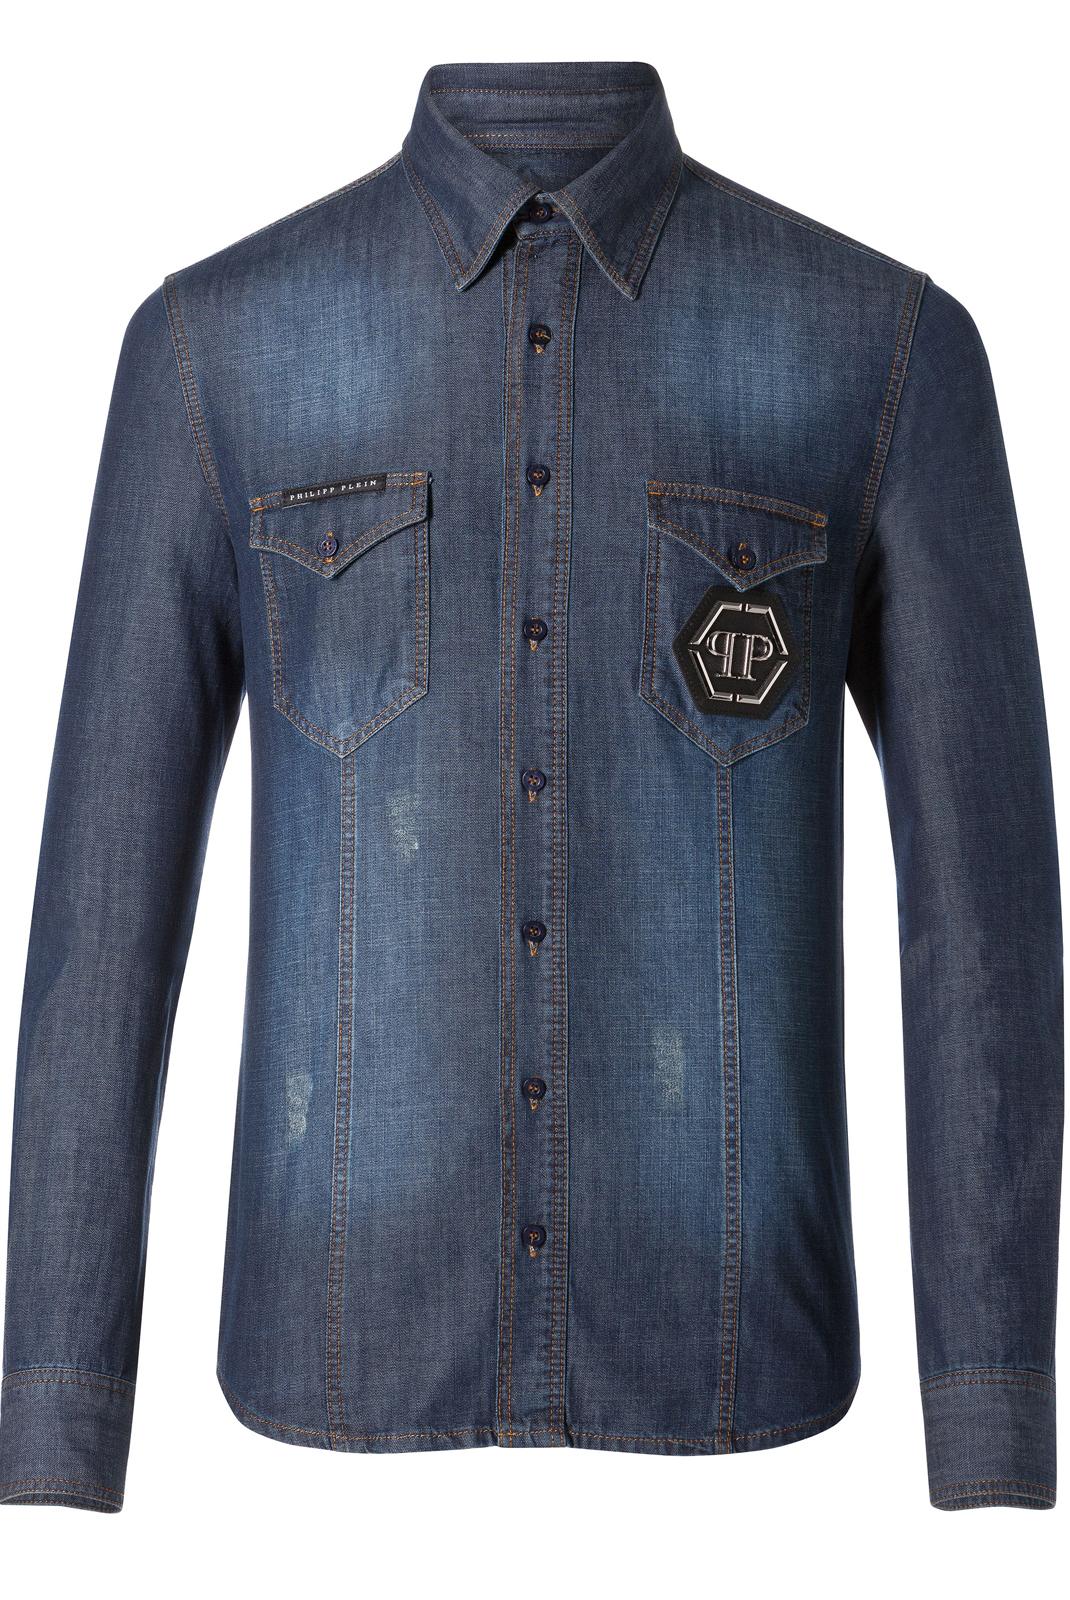 Chemises manches longues  Philipp plein MDP0036 FULL 14SE JEANS